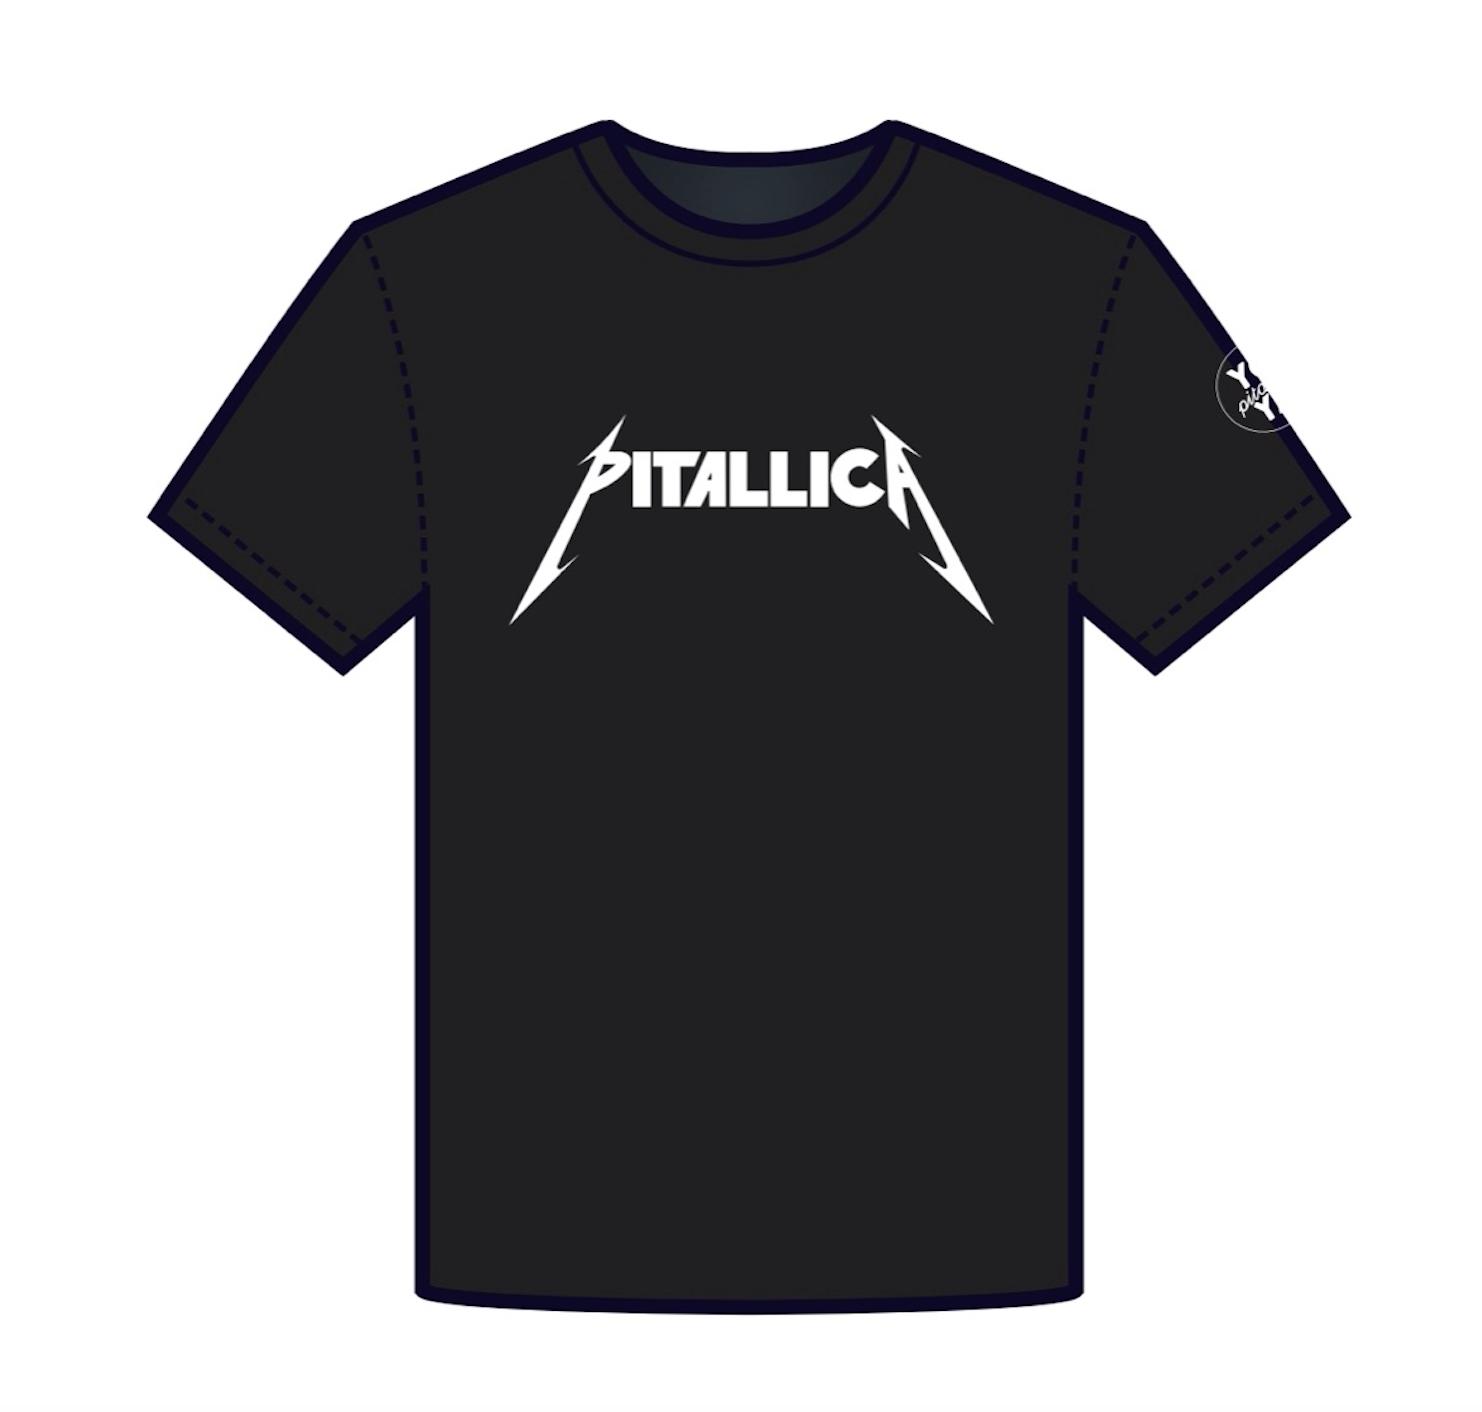 YOYA Shirt Pitallica